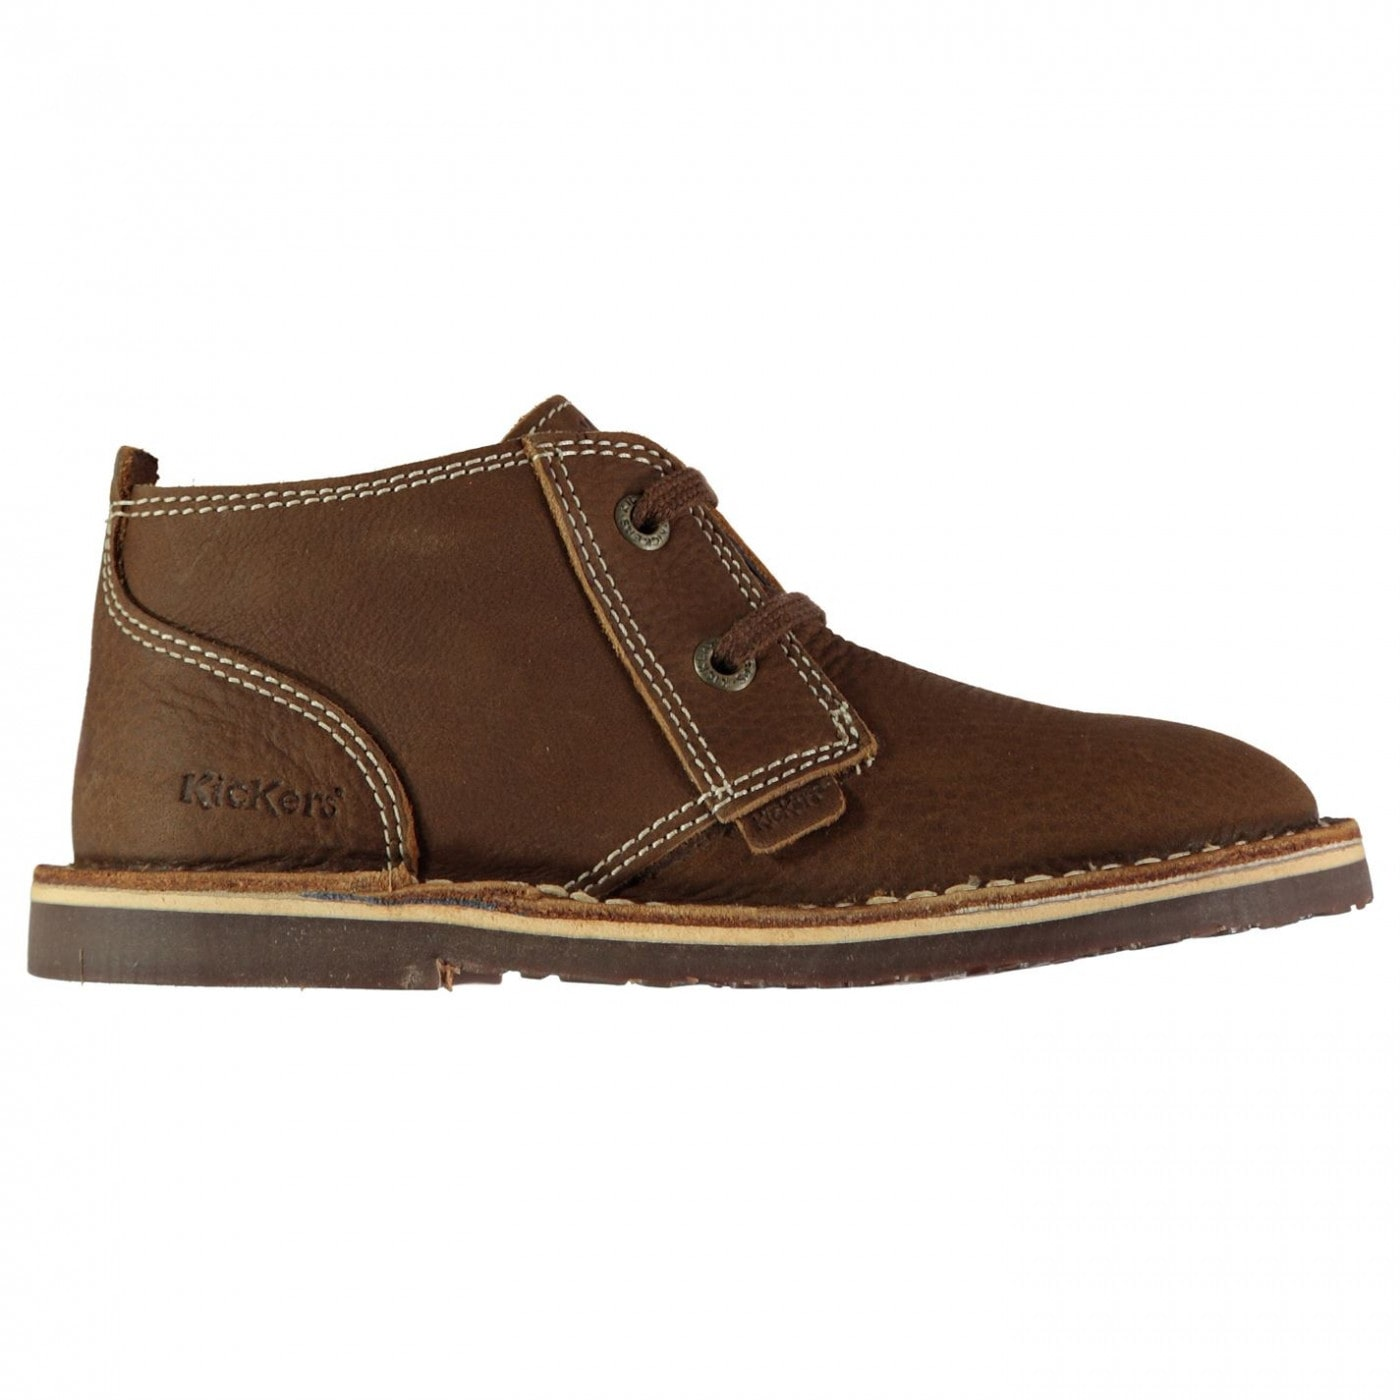 Kickers Adlar Boys Desert Boots